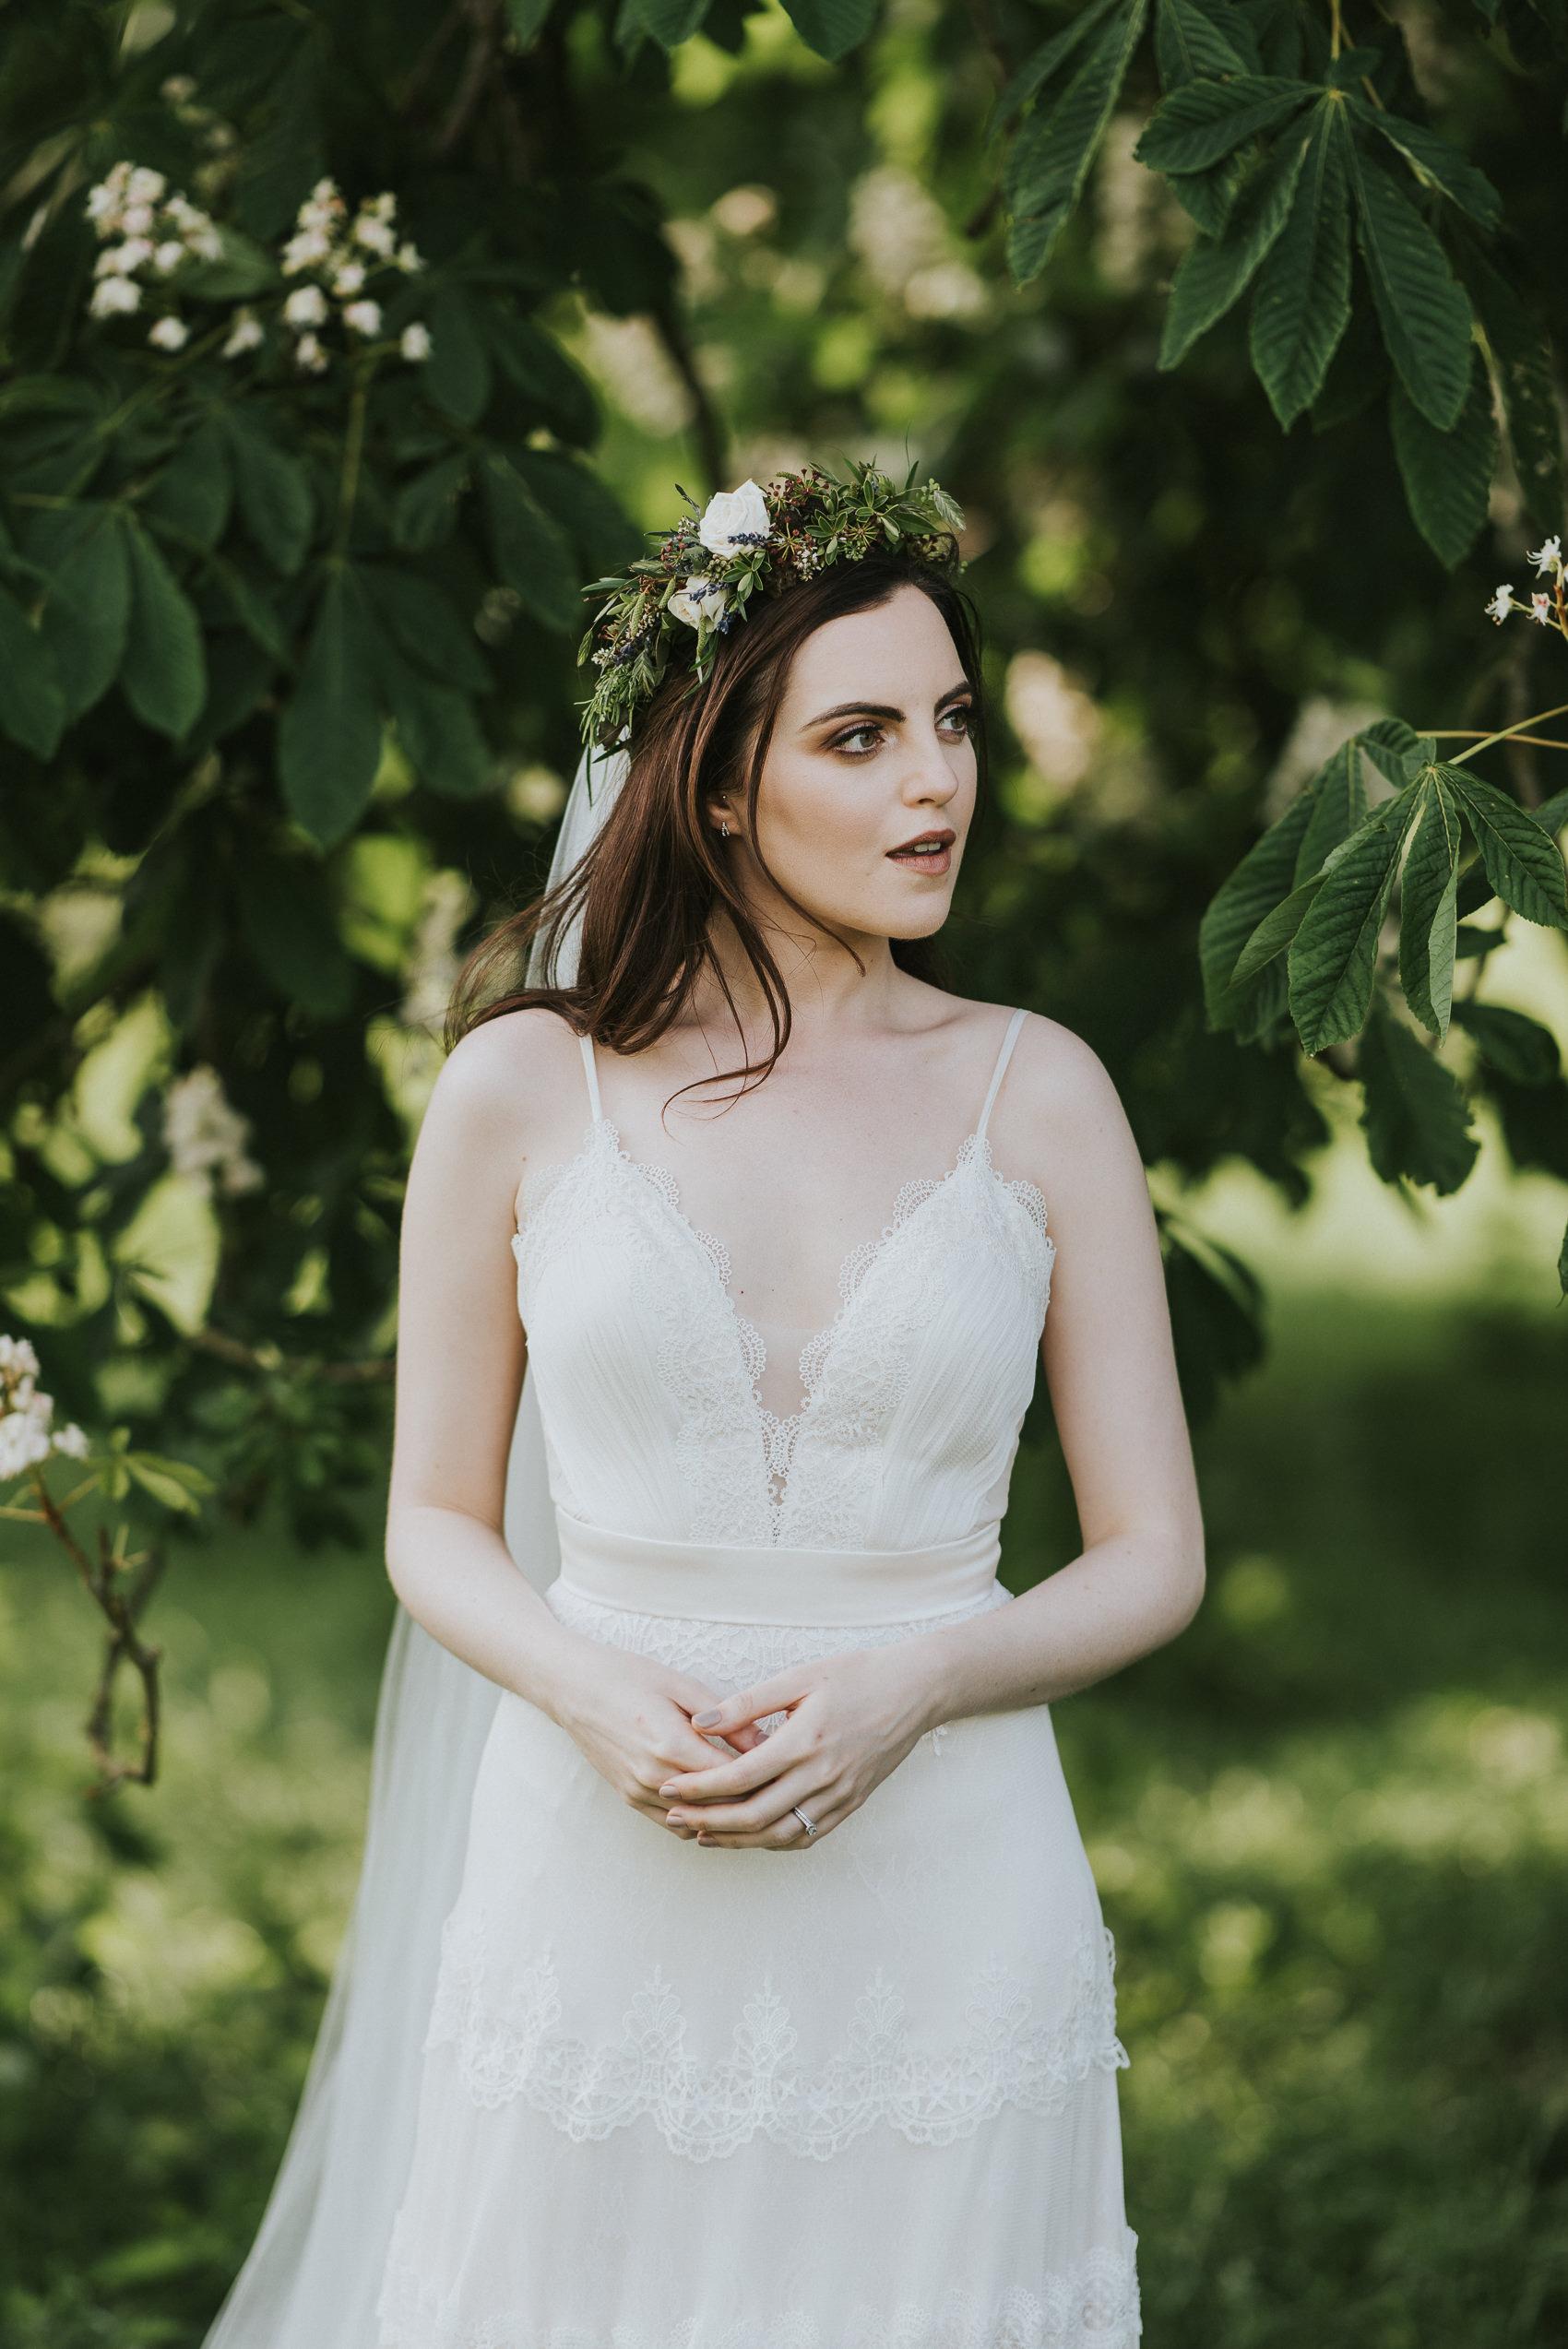 Photography by Ciara - wedding photographer 13